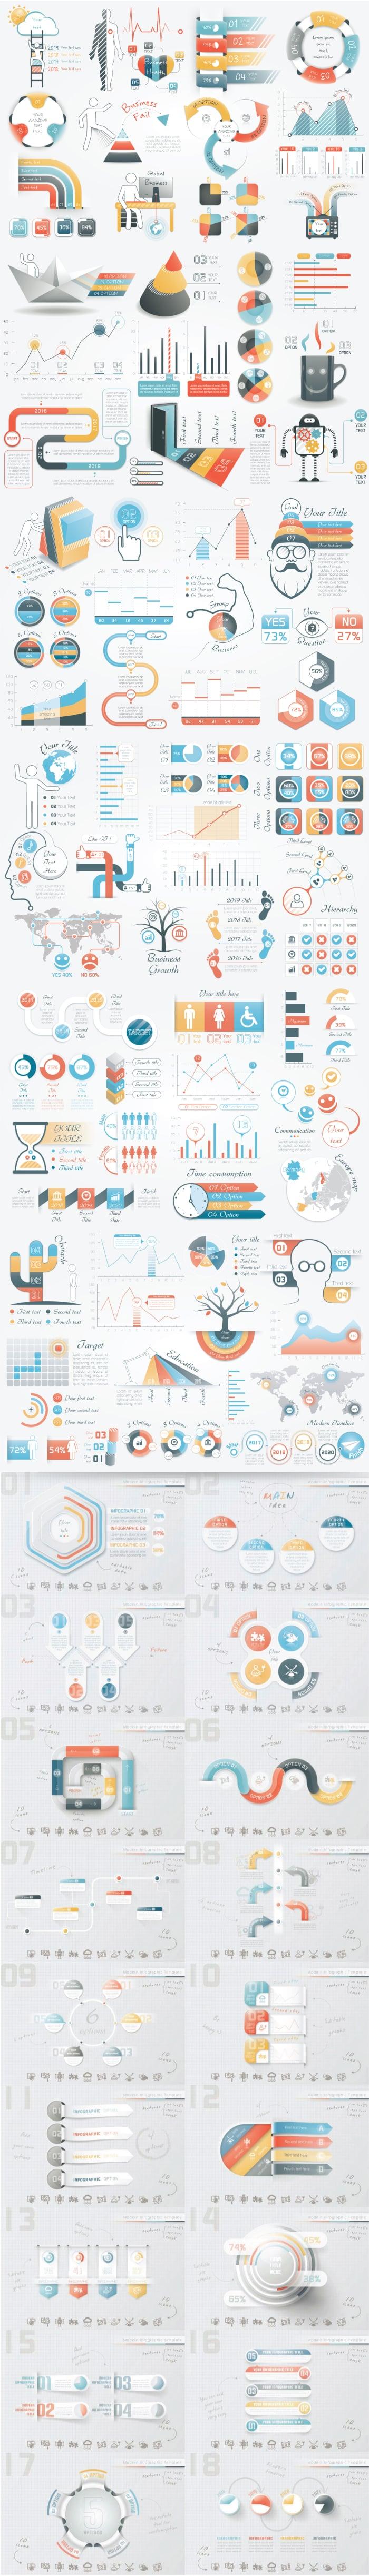 Awesome Infographics Templates Bundle - infographics